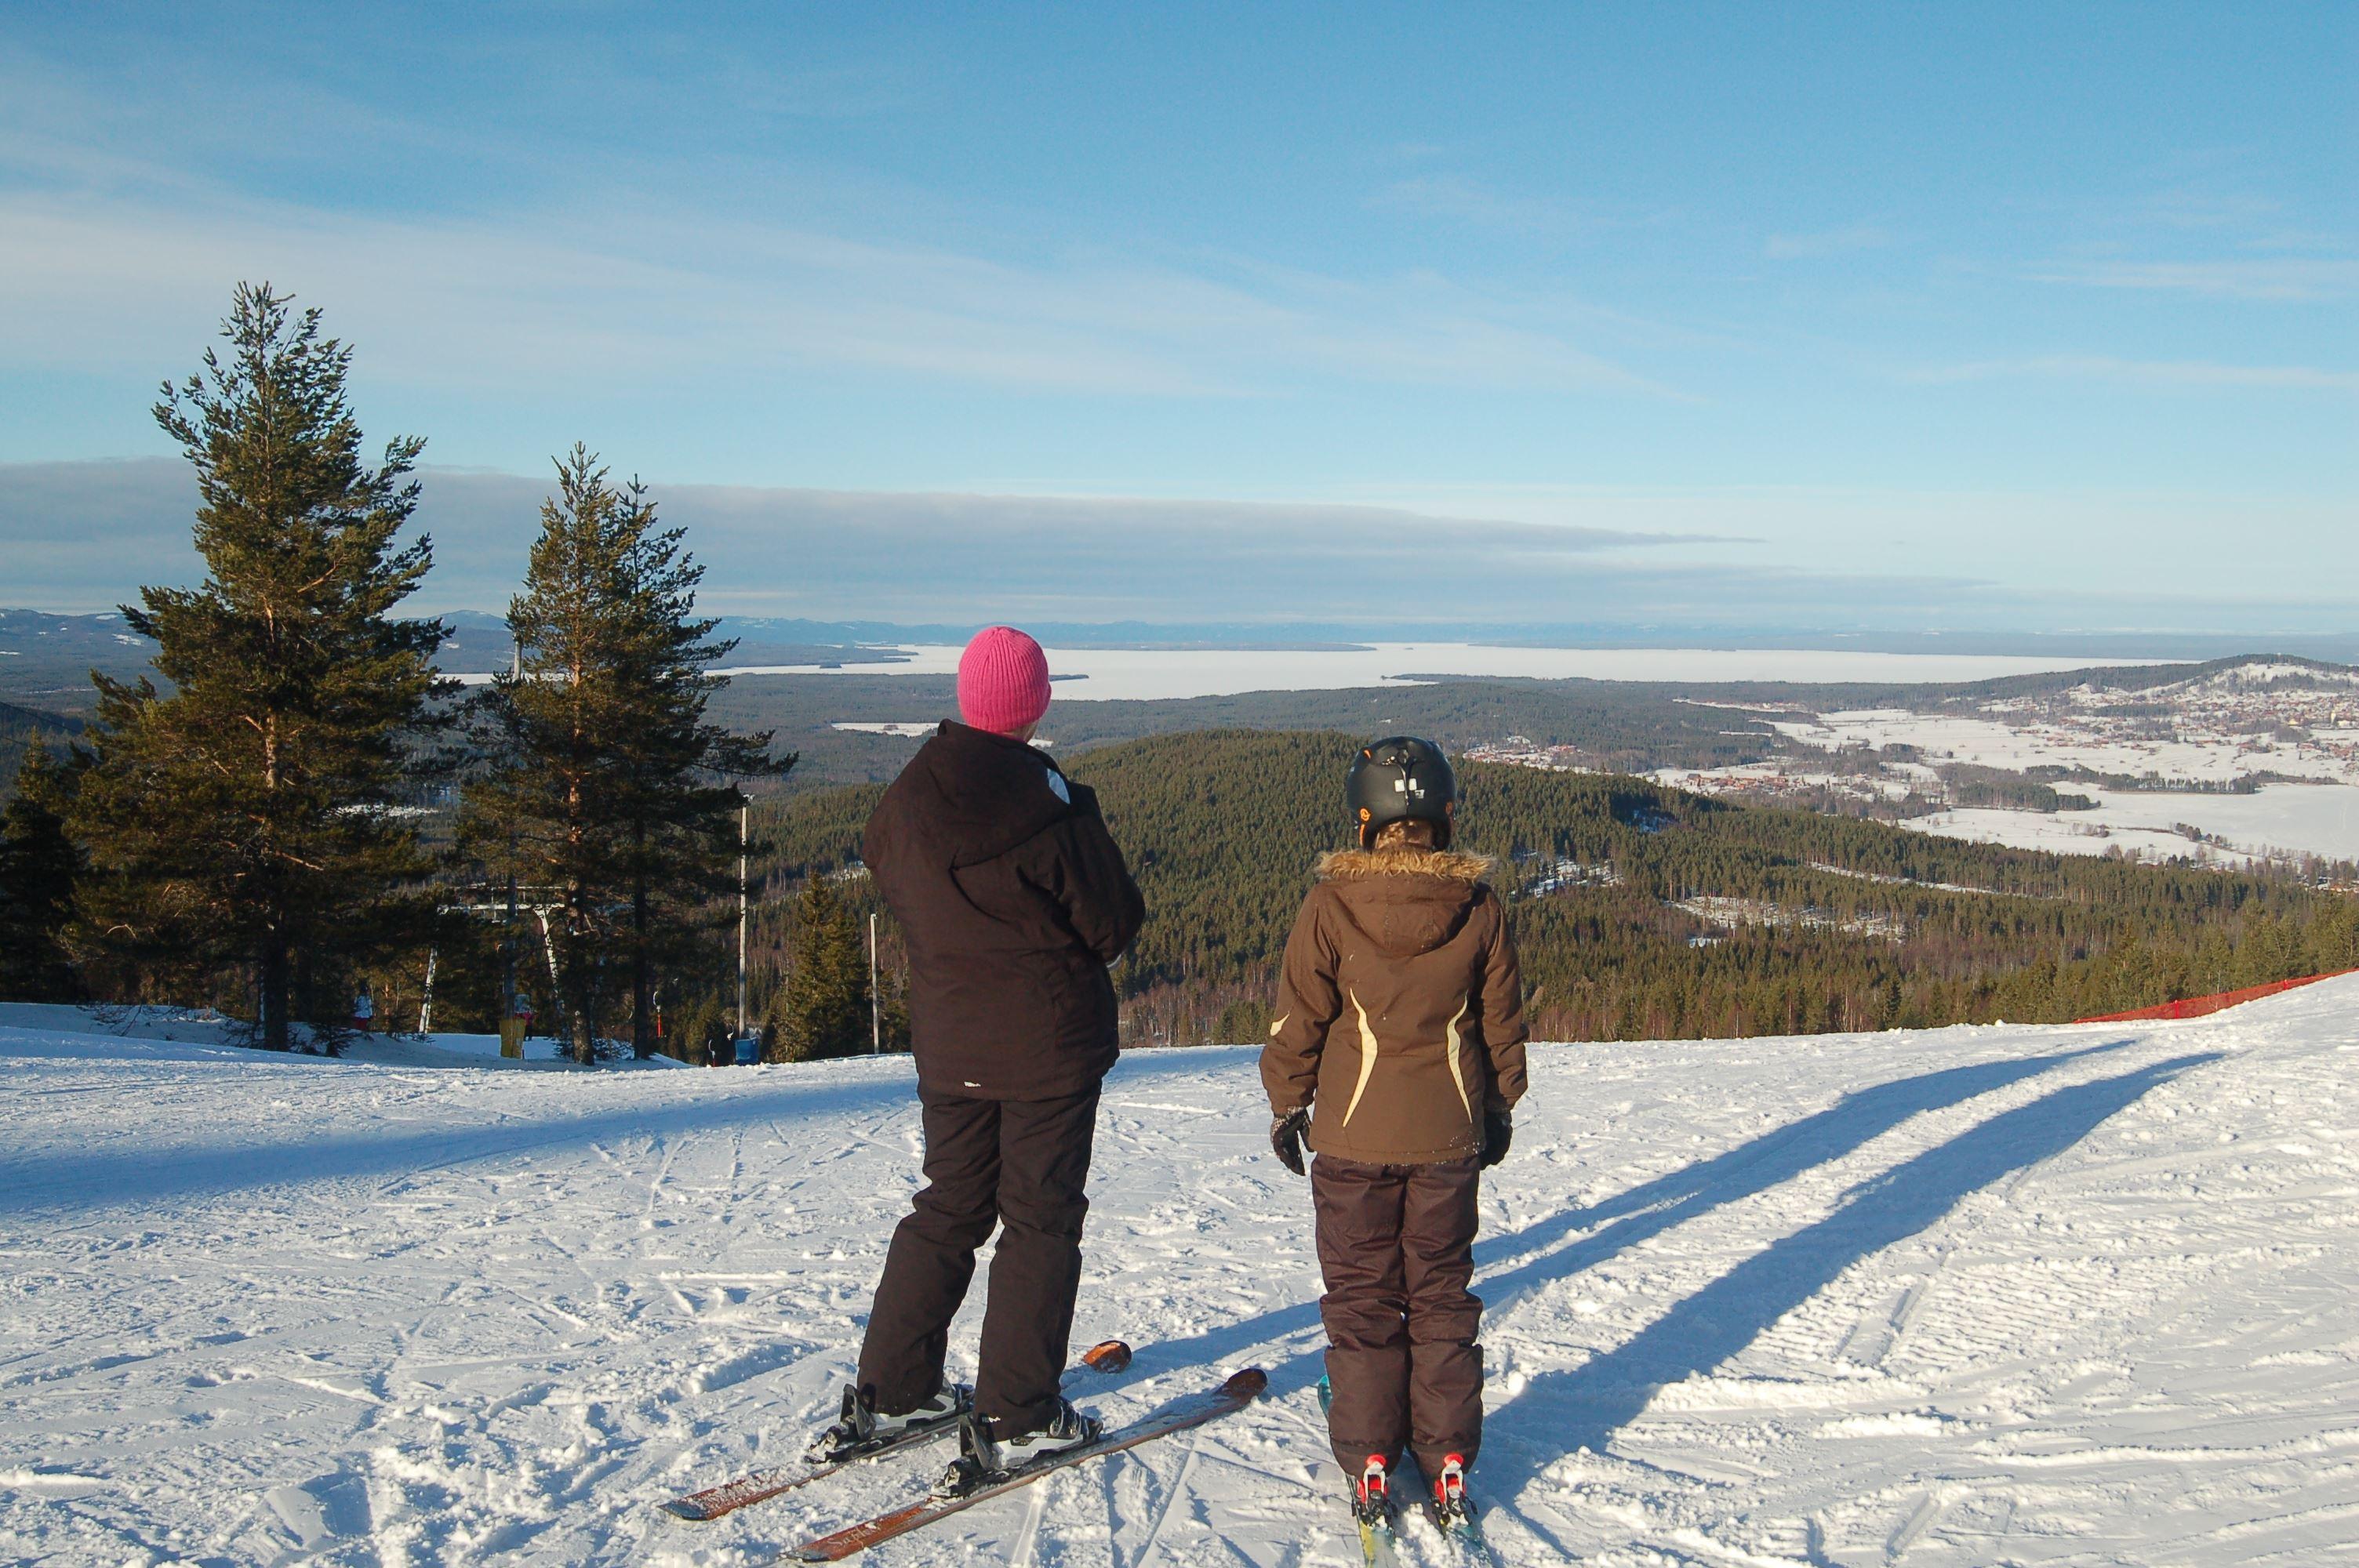 Leksands kommun, Granberget - Leksand Ski